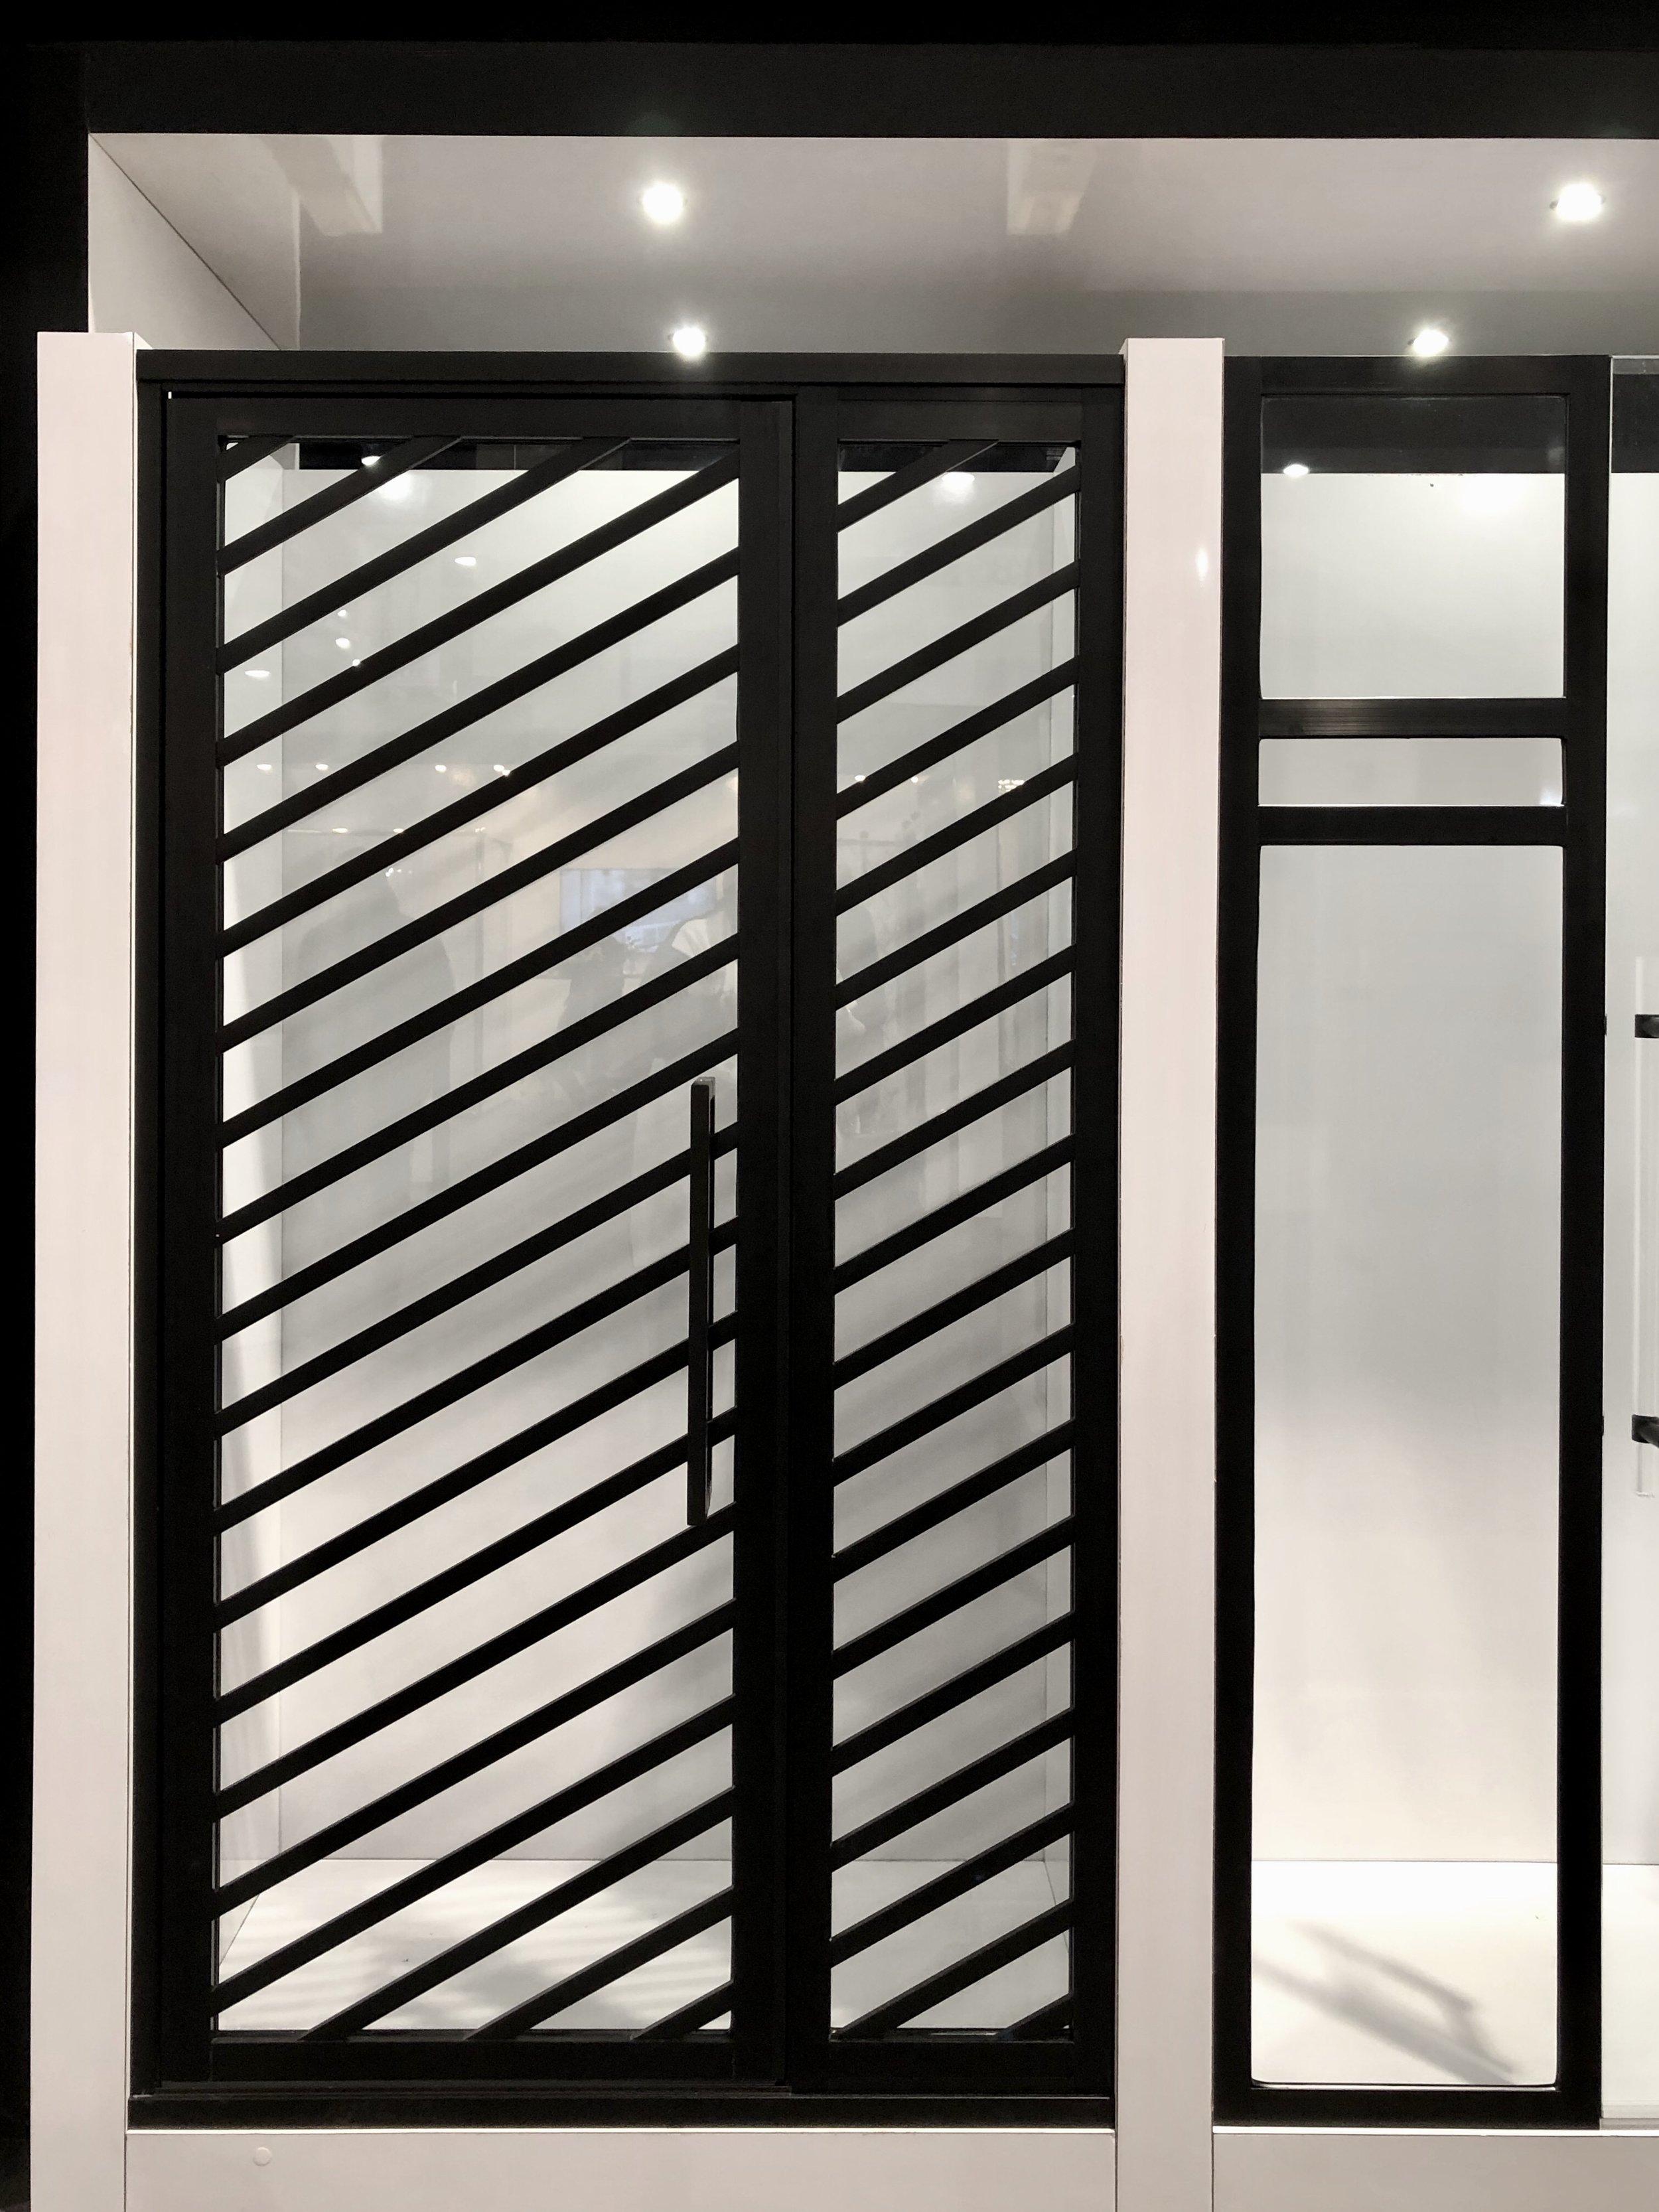 Coastal Shower Doors modern look black framing shower enclosure | KBIS 2019 Surfaces Trends